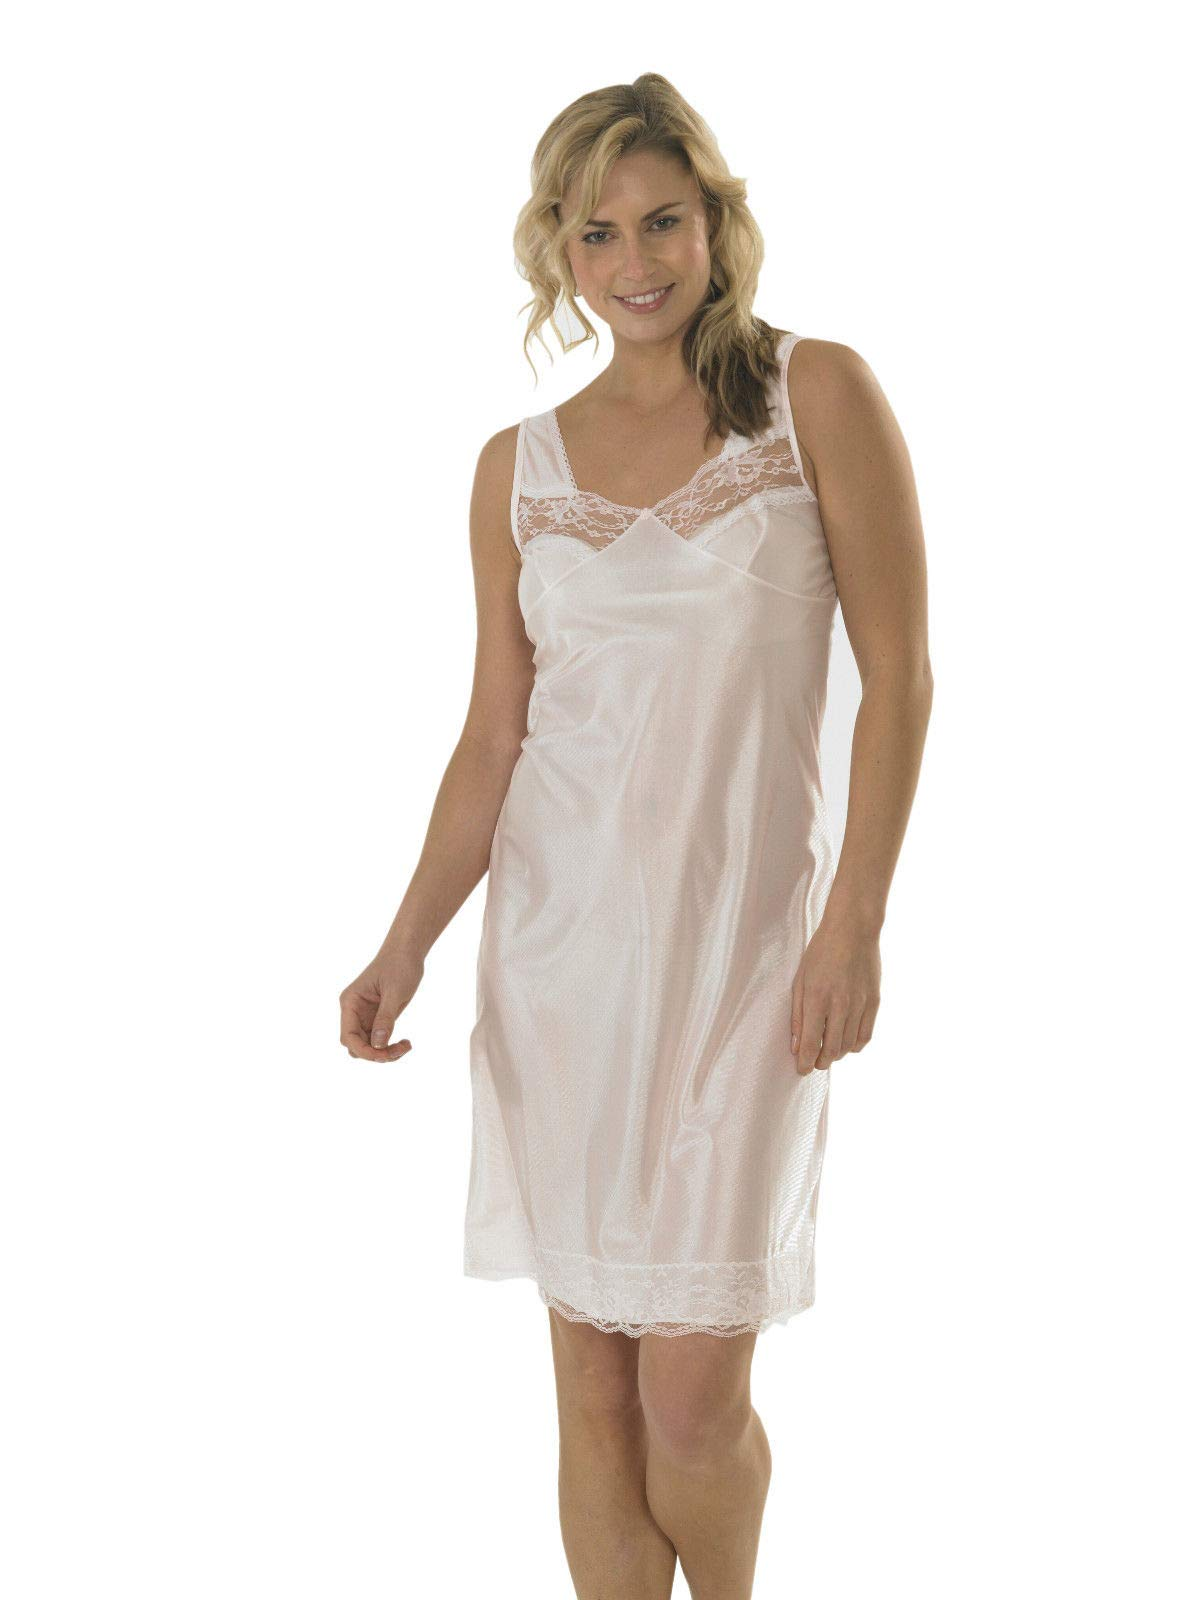 Ladies black size 12 petticoat slip underskirt anti static cling resistant M /& S